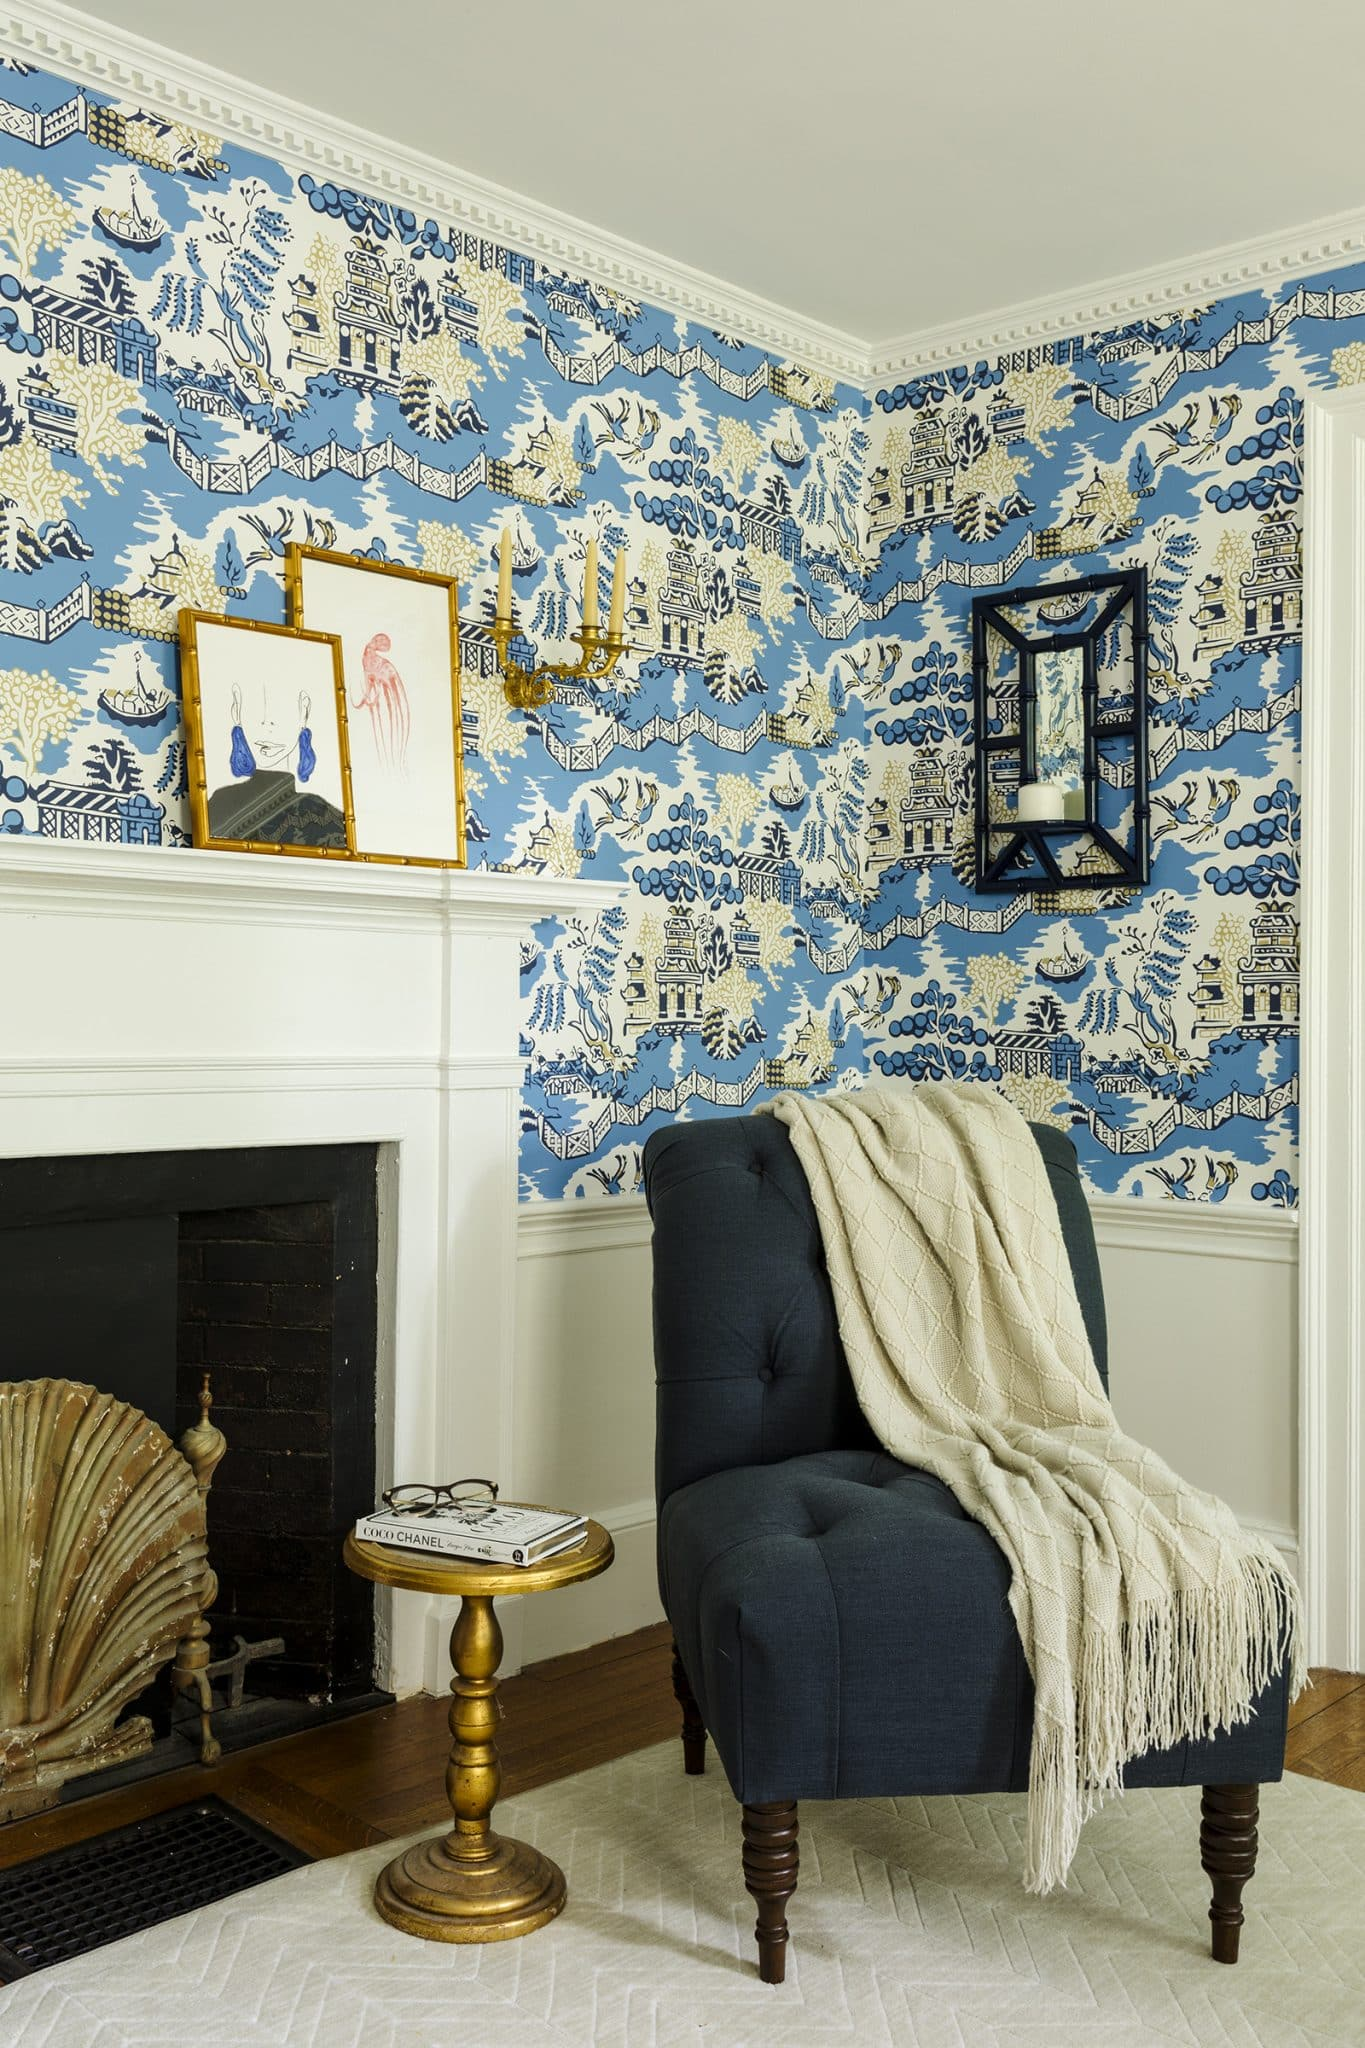 Asian Garden Colonial Hamilton MA Fireplace Vignette